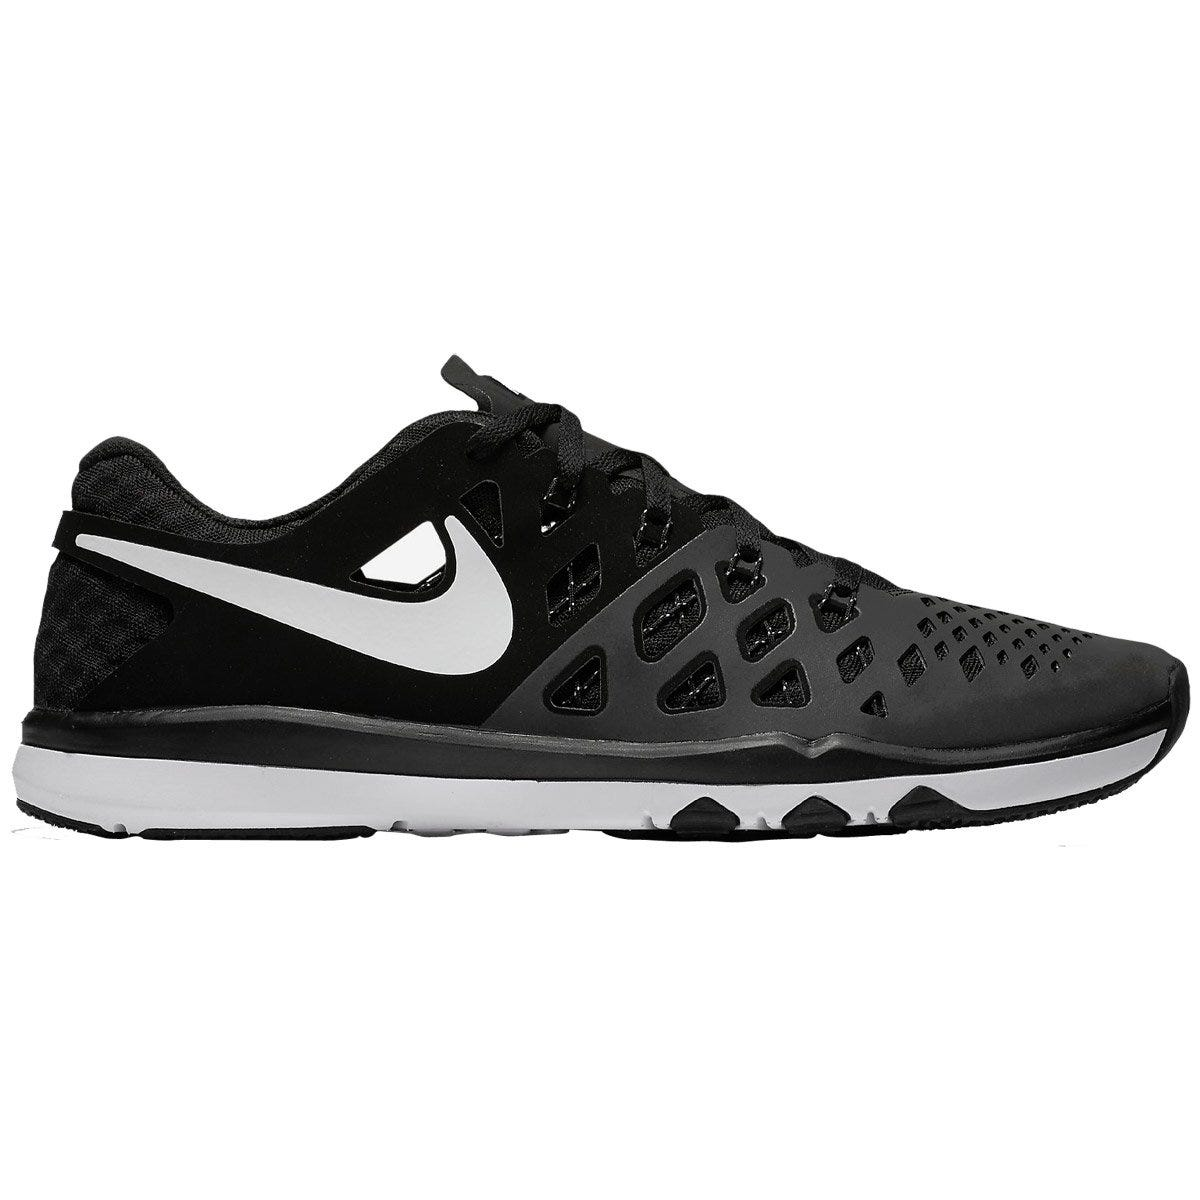 Nike Train Speed 4 Men's Traning Shoes - Black/White